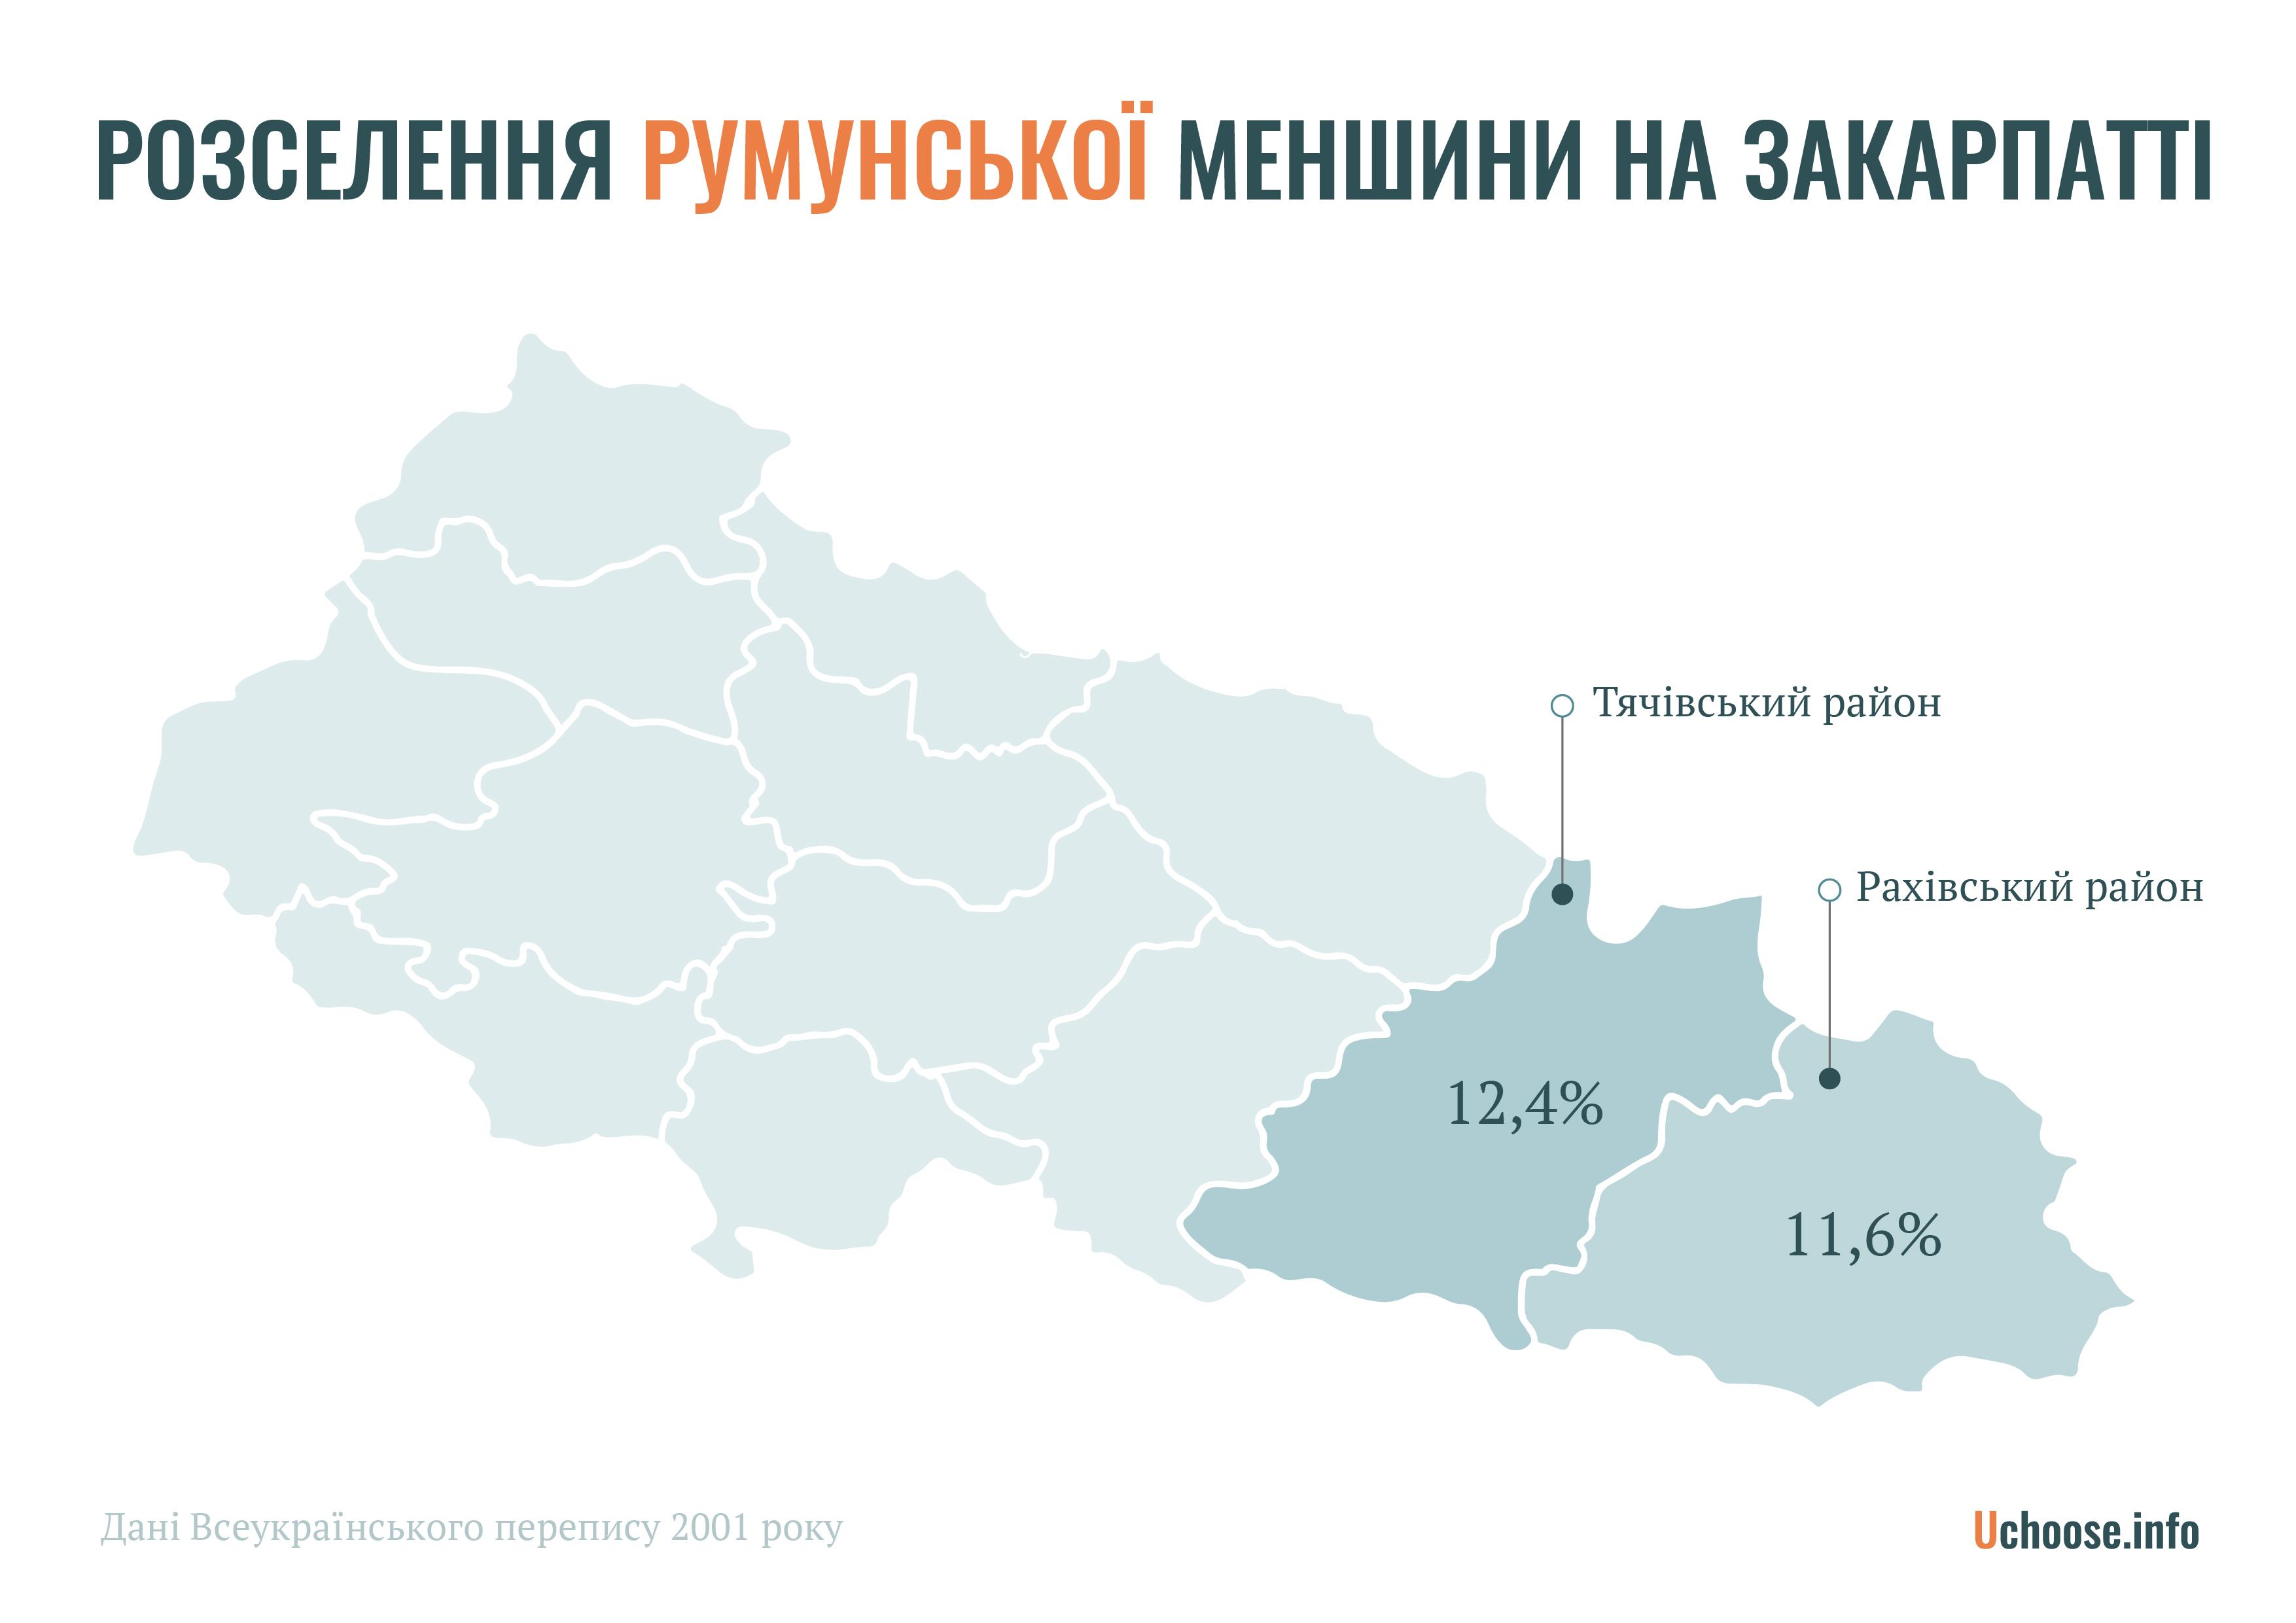 Розселення румунської меншини на Закарпатті